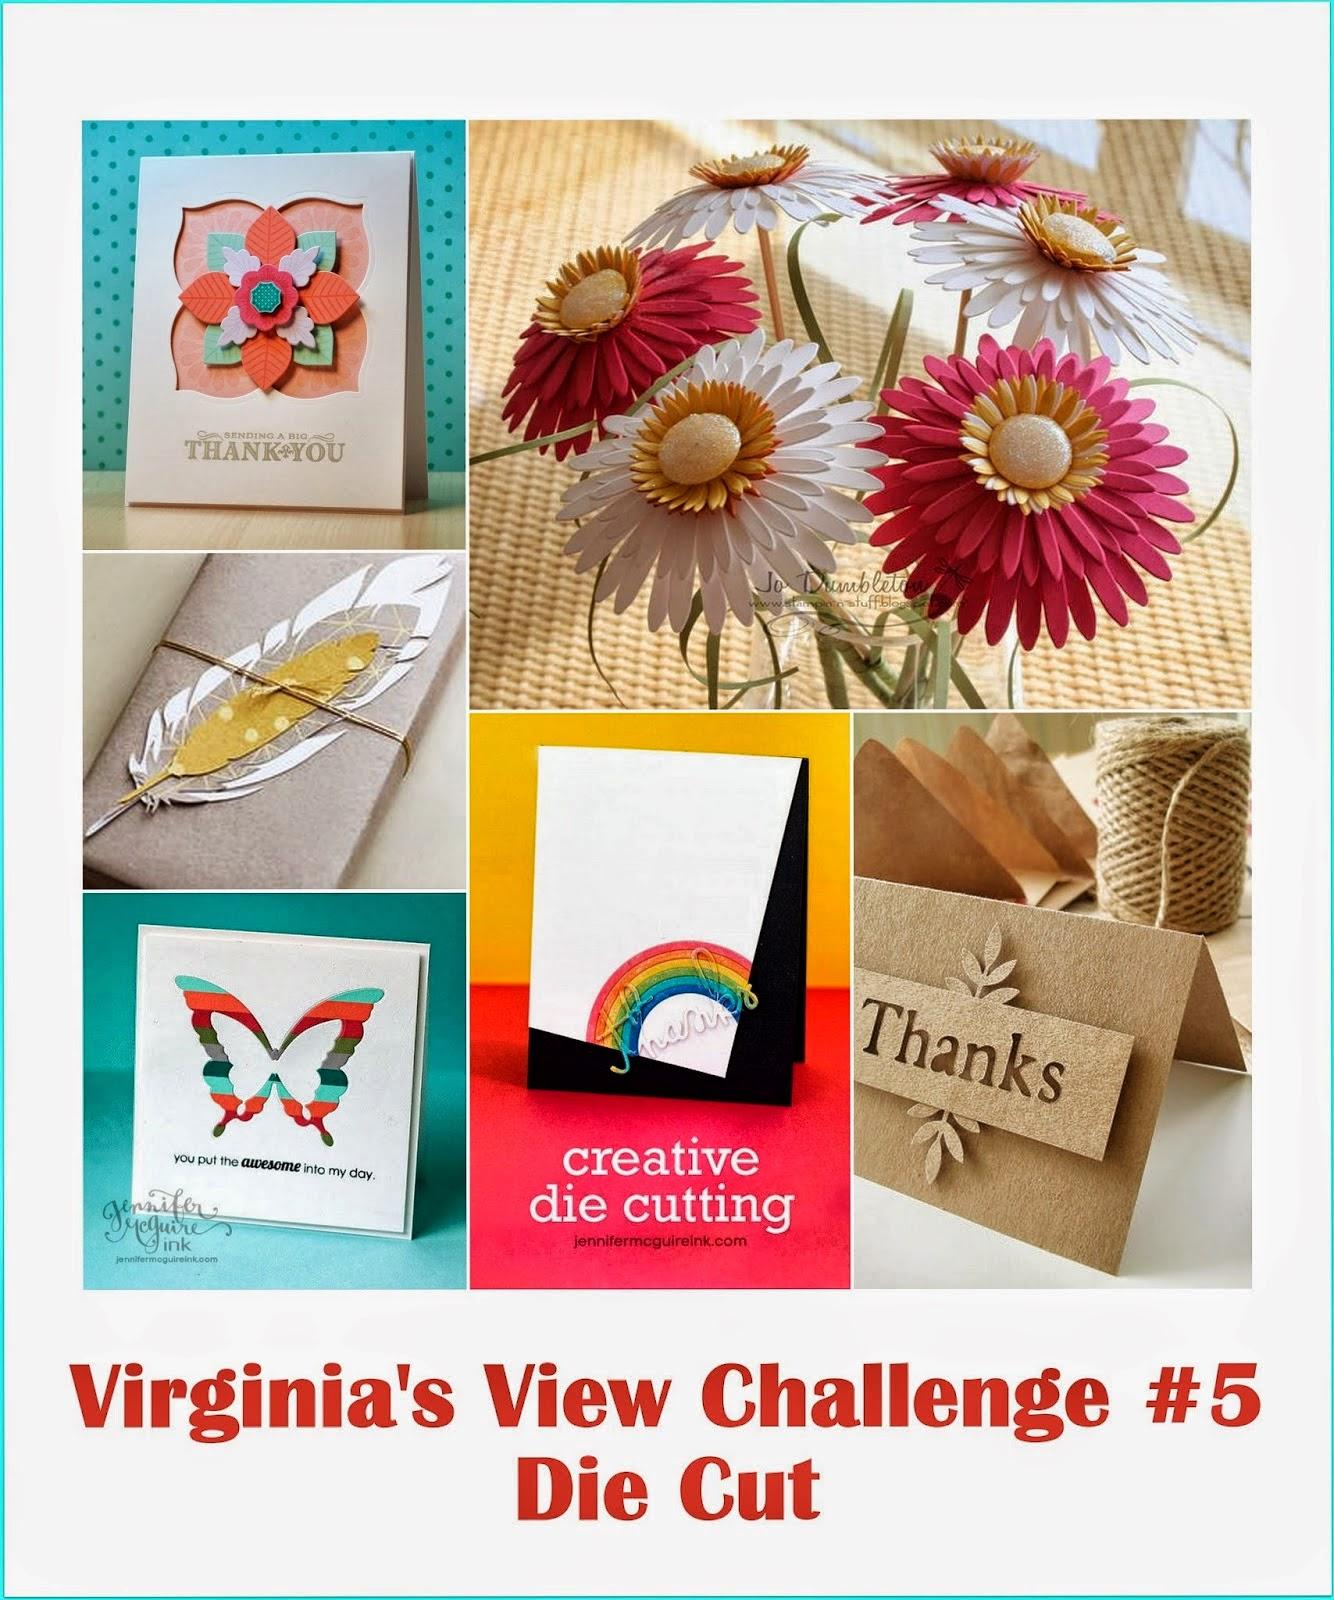 http://virginiasviewchallenge.blogspot.com.au/2014/07/virginias-view-challenge-5.html